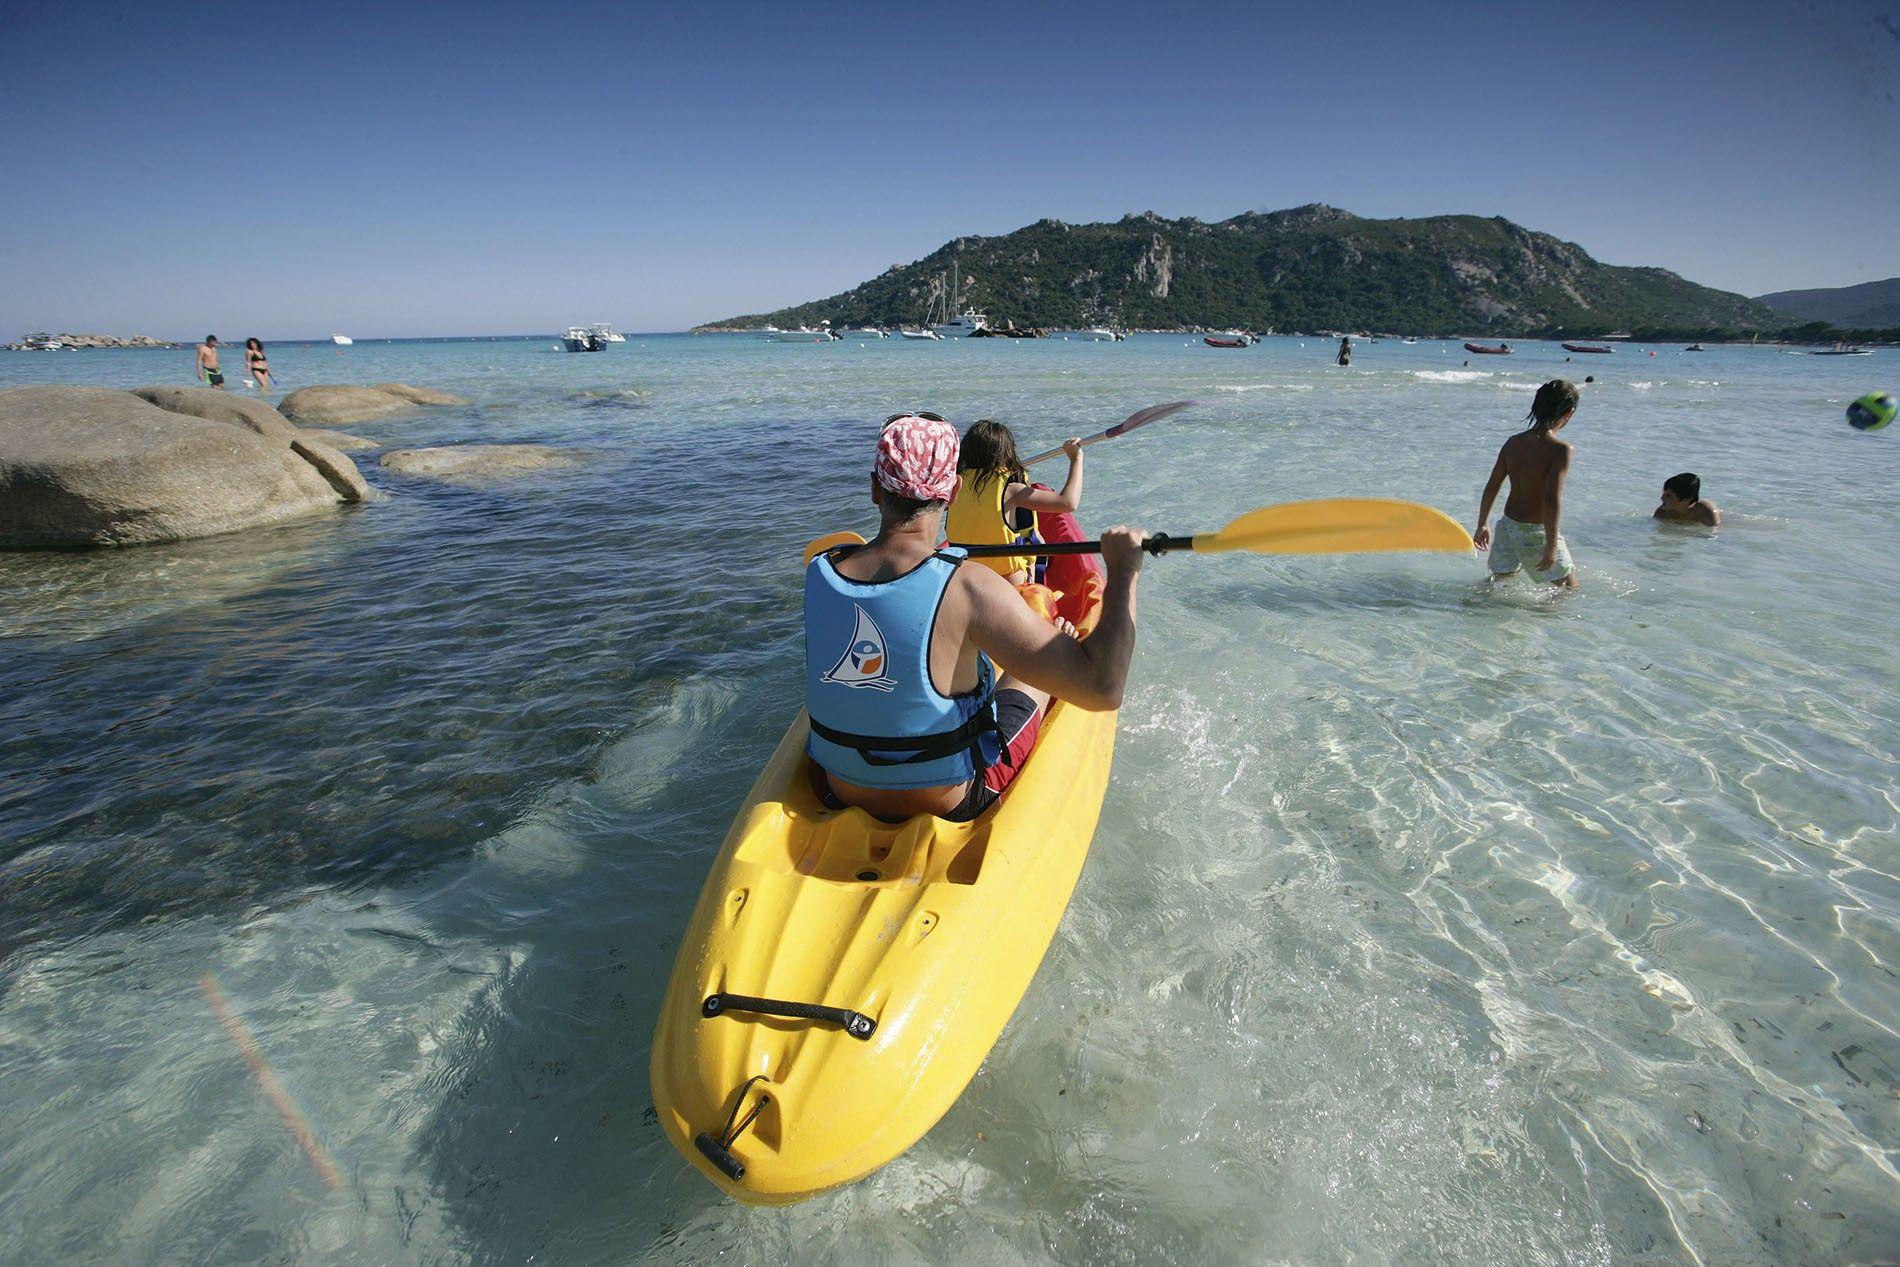 Kayaking, Santa Giulia Beach